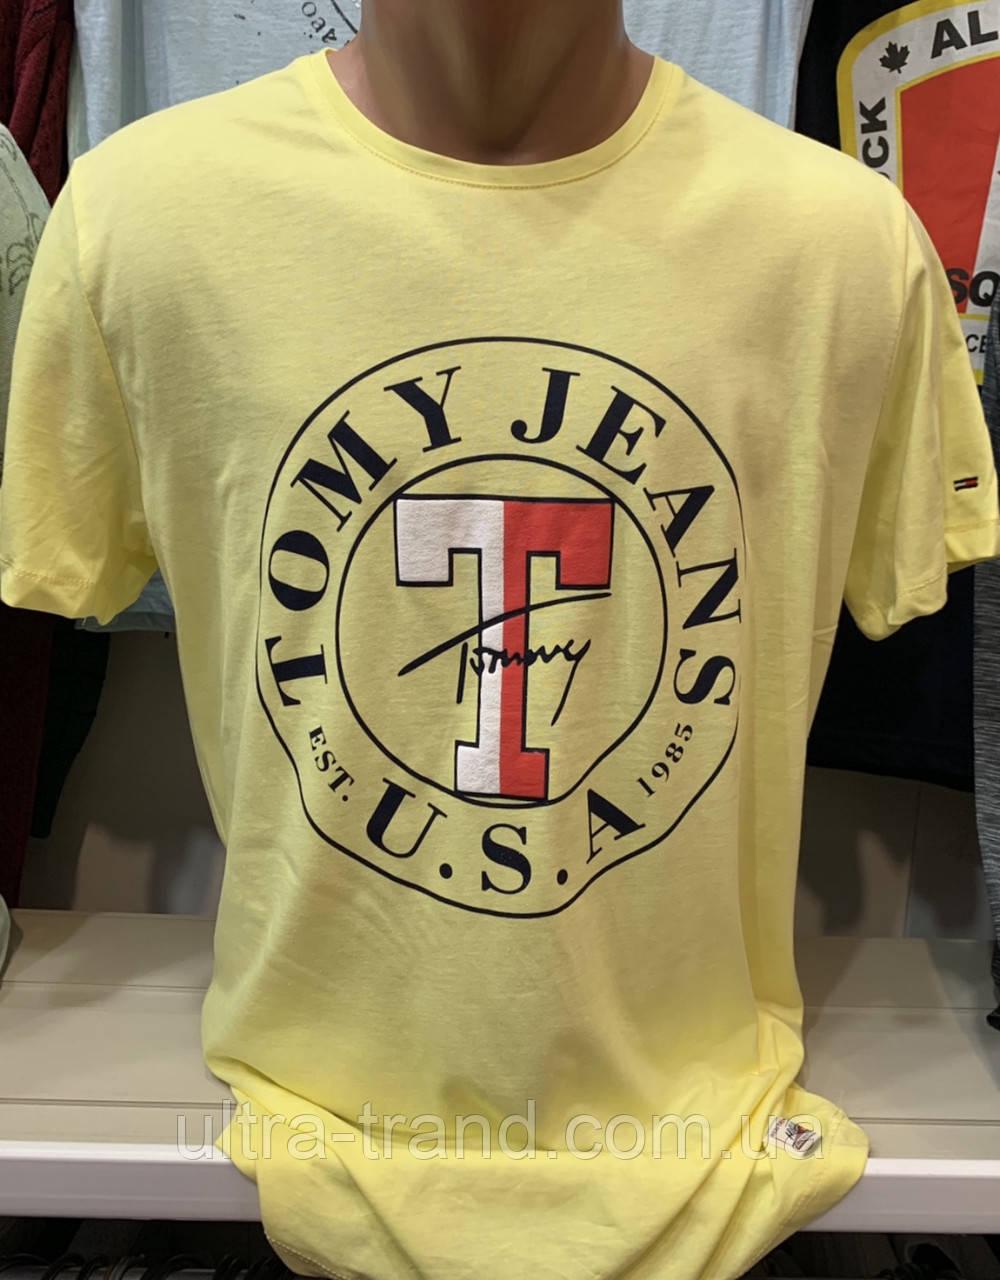 fdf17163d8dbe Мужские брендовые футболки Hilfiger- турецкая реплика, цена 250 грн.,  купить в Харькове — Prom.ua (ID#551034067)